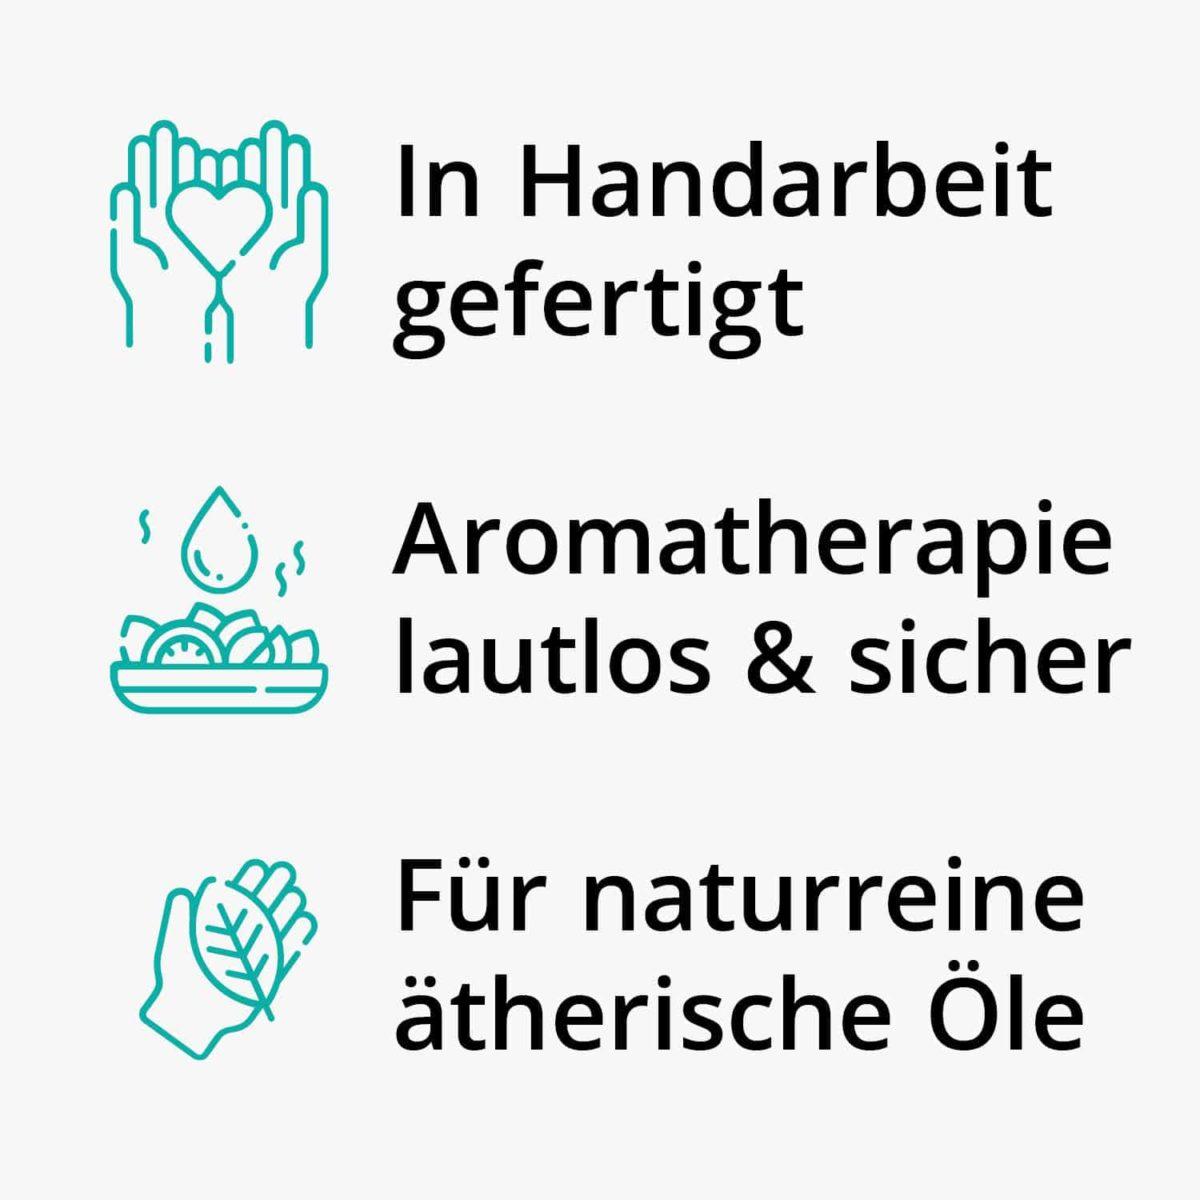 Casida Duftstein aus Keramik 1 Stk. 17439912 PZN Apotheke Aromatherapie Ätherische Öle Diffuser4